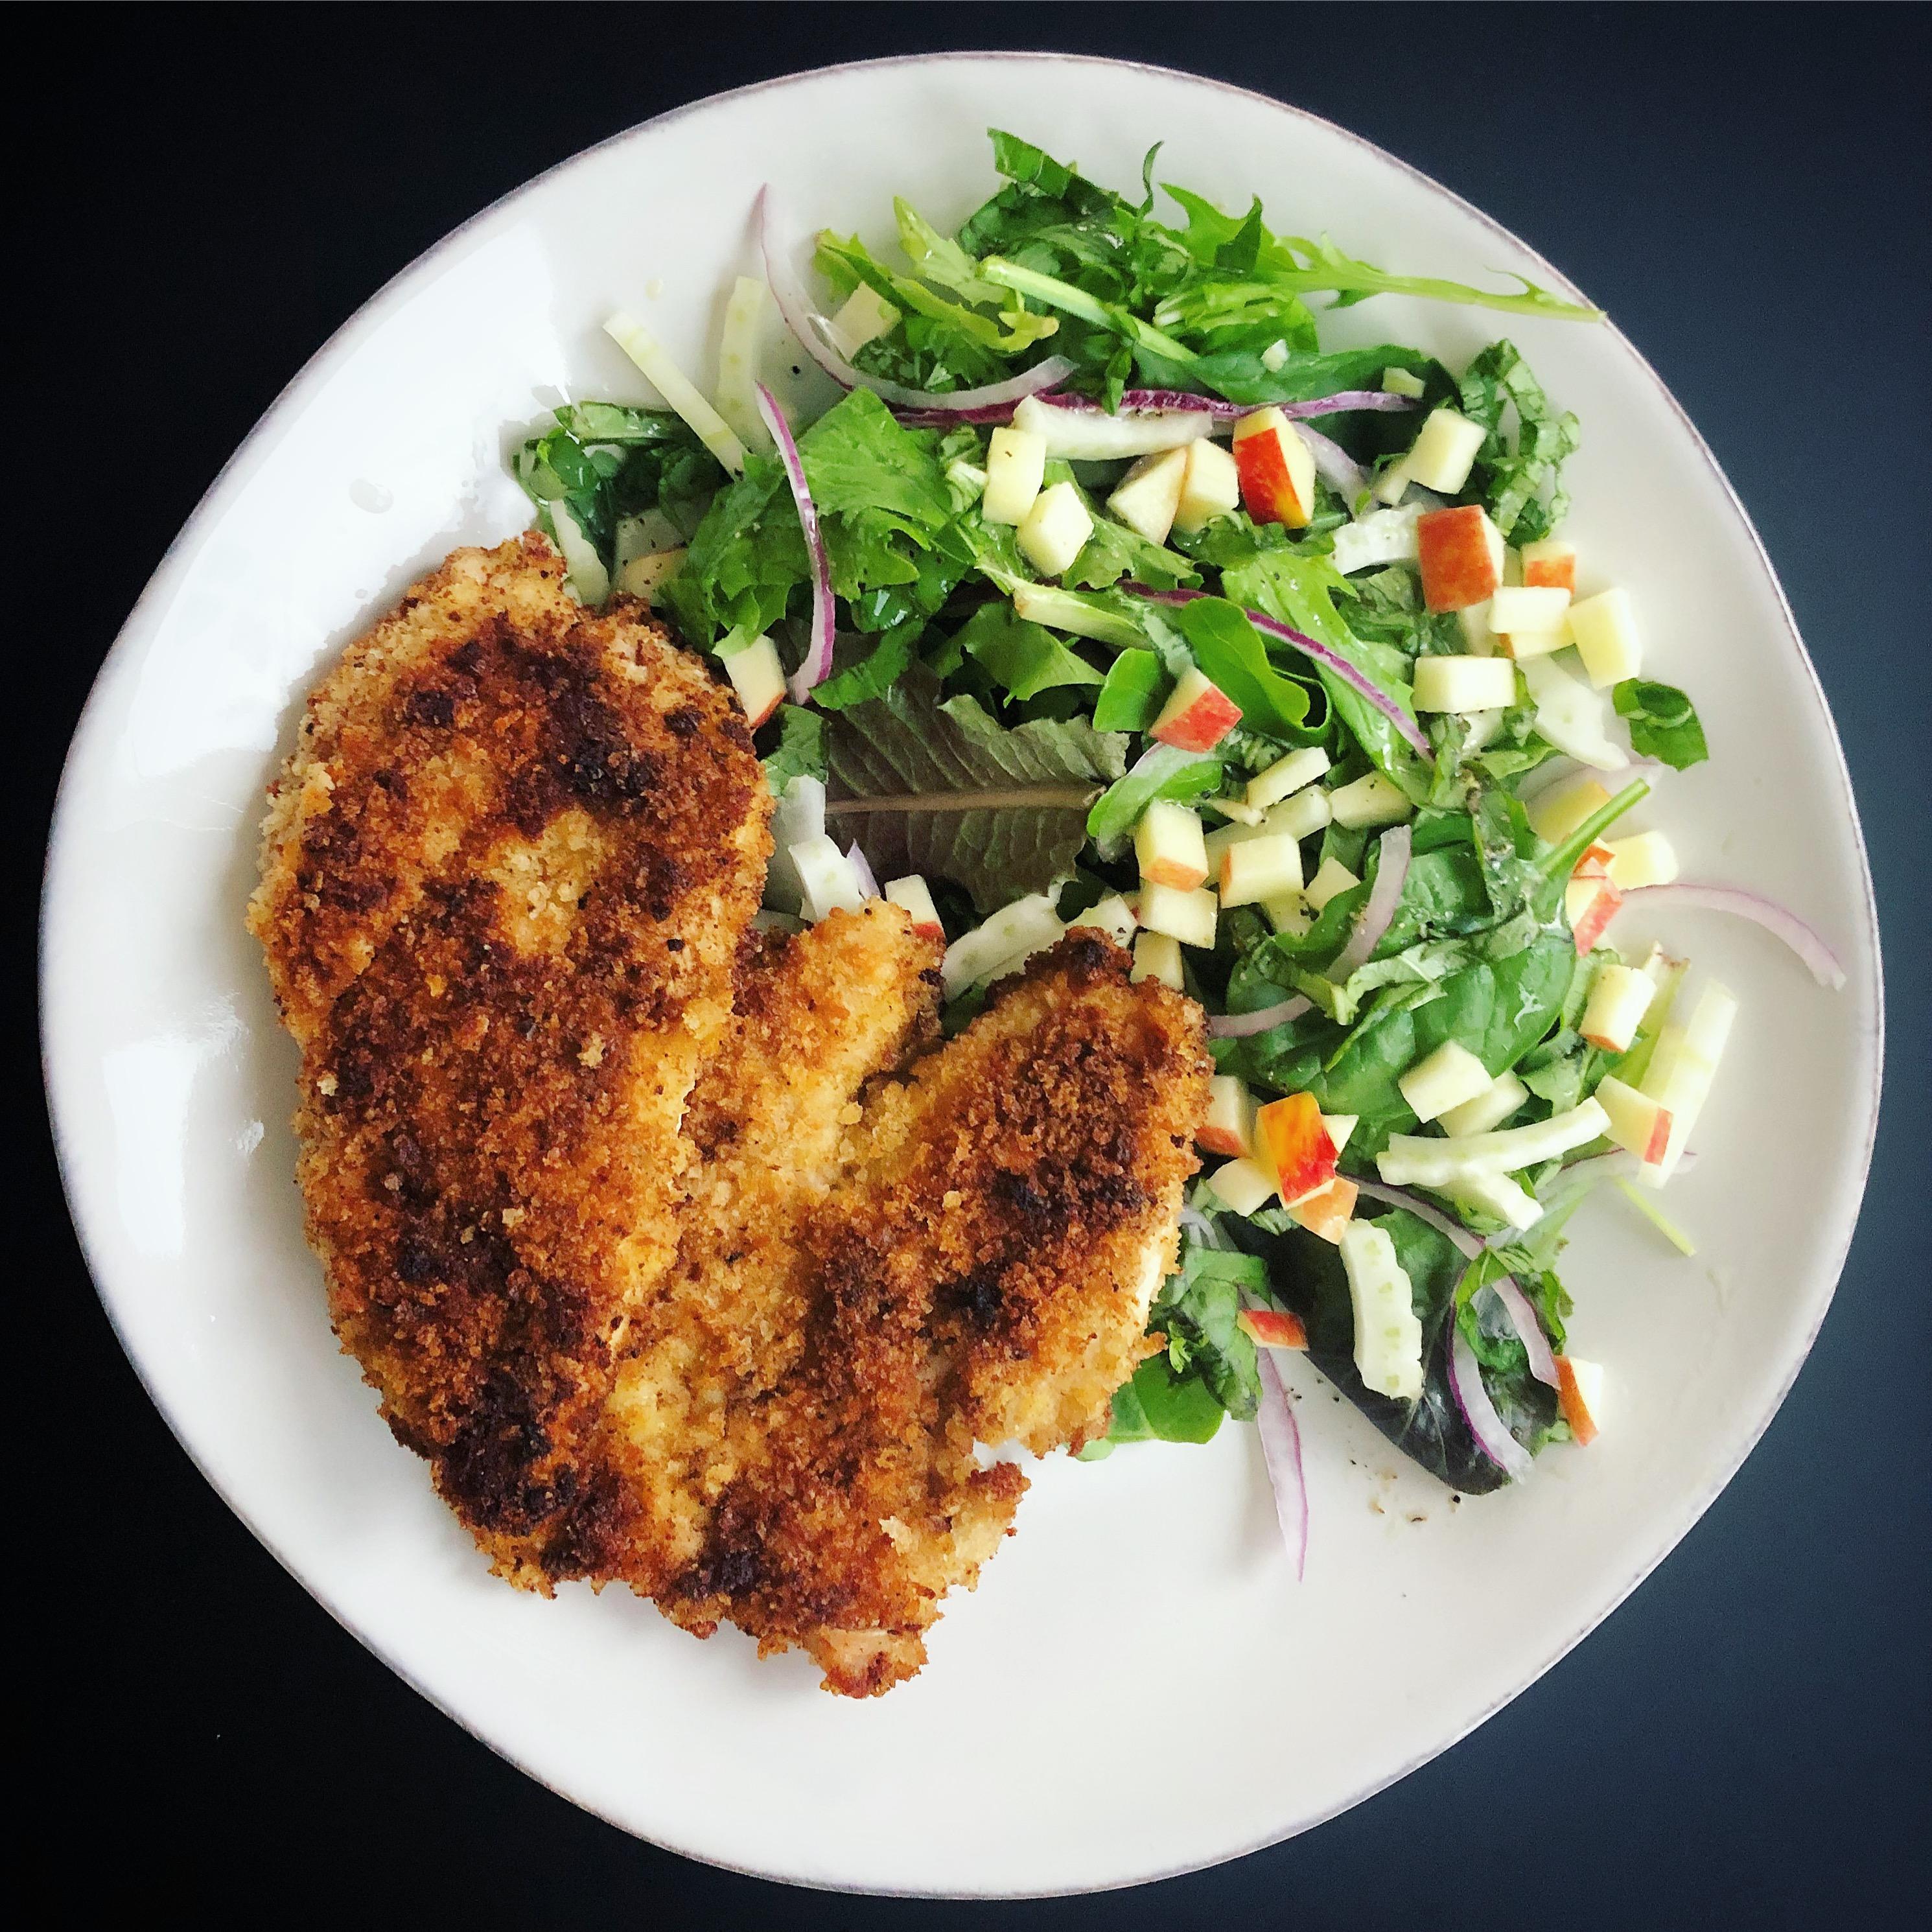 Crispy Almond Chicken with Apple-Fennel Salad